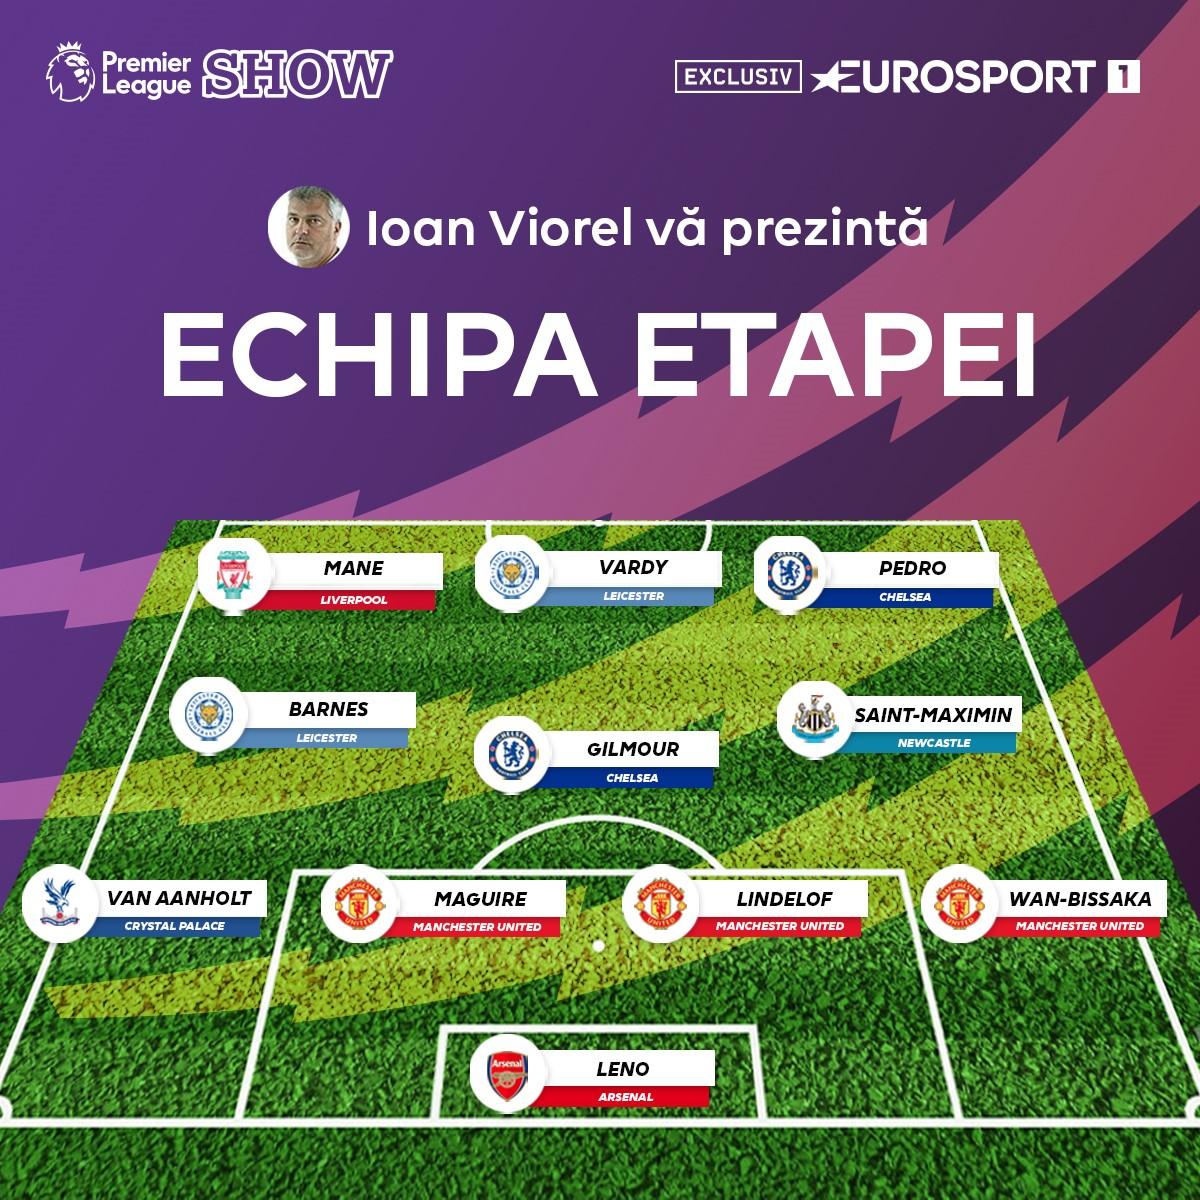 https://i.eurosport.com/2020/03/11/2792788.jpg